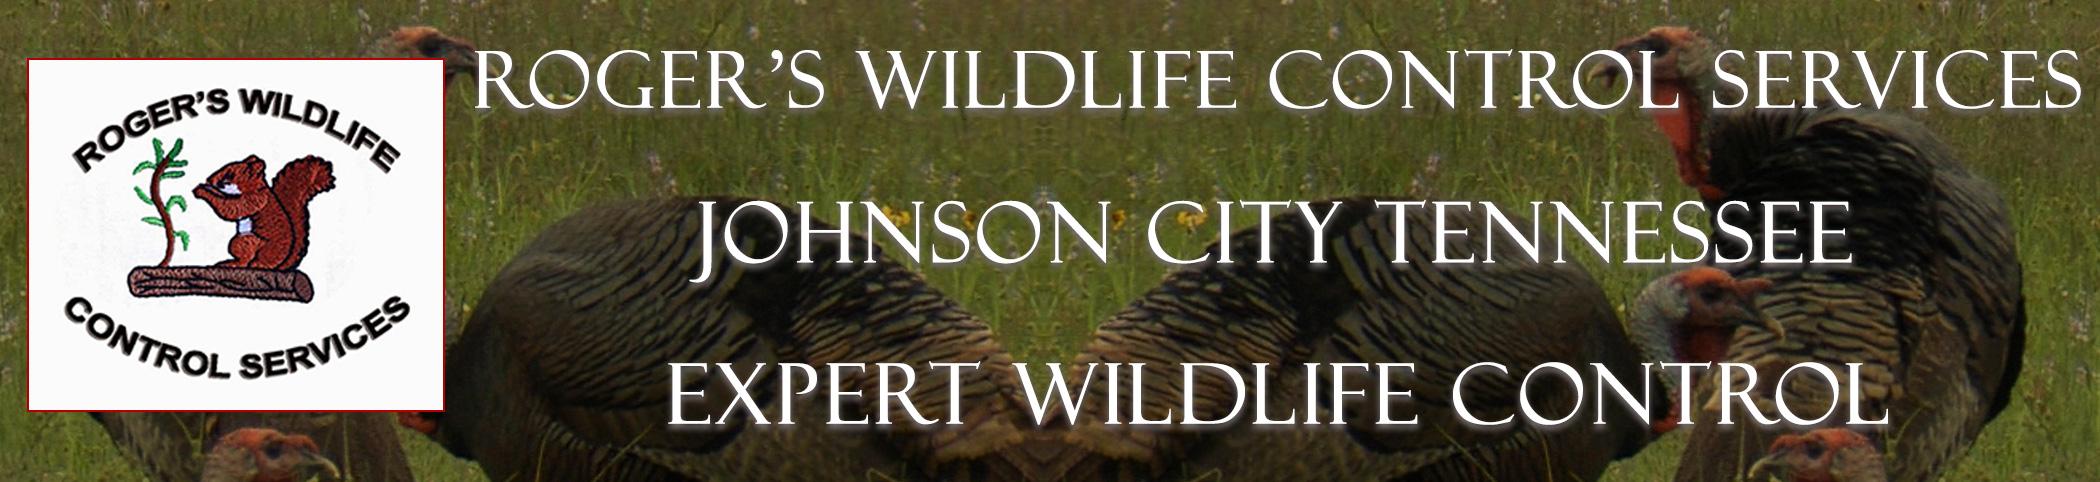 rogers_wildlife_johnson_city_TN_headers